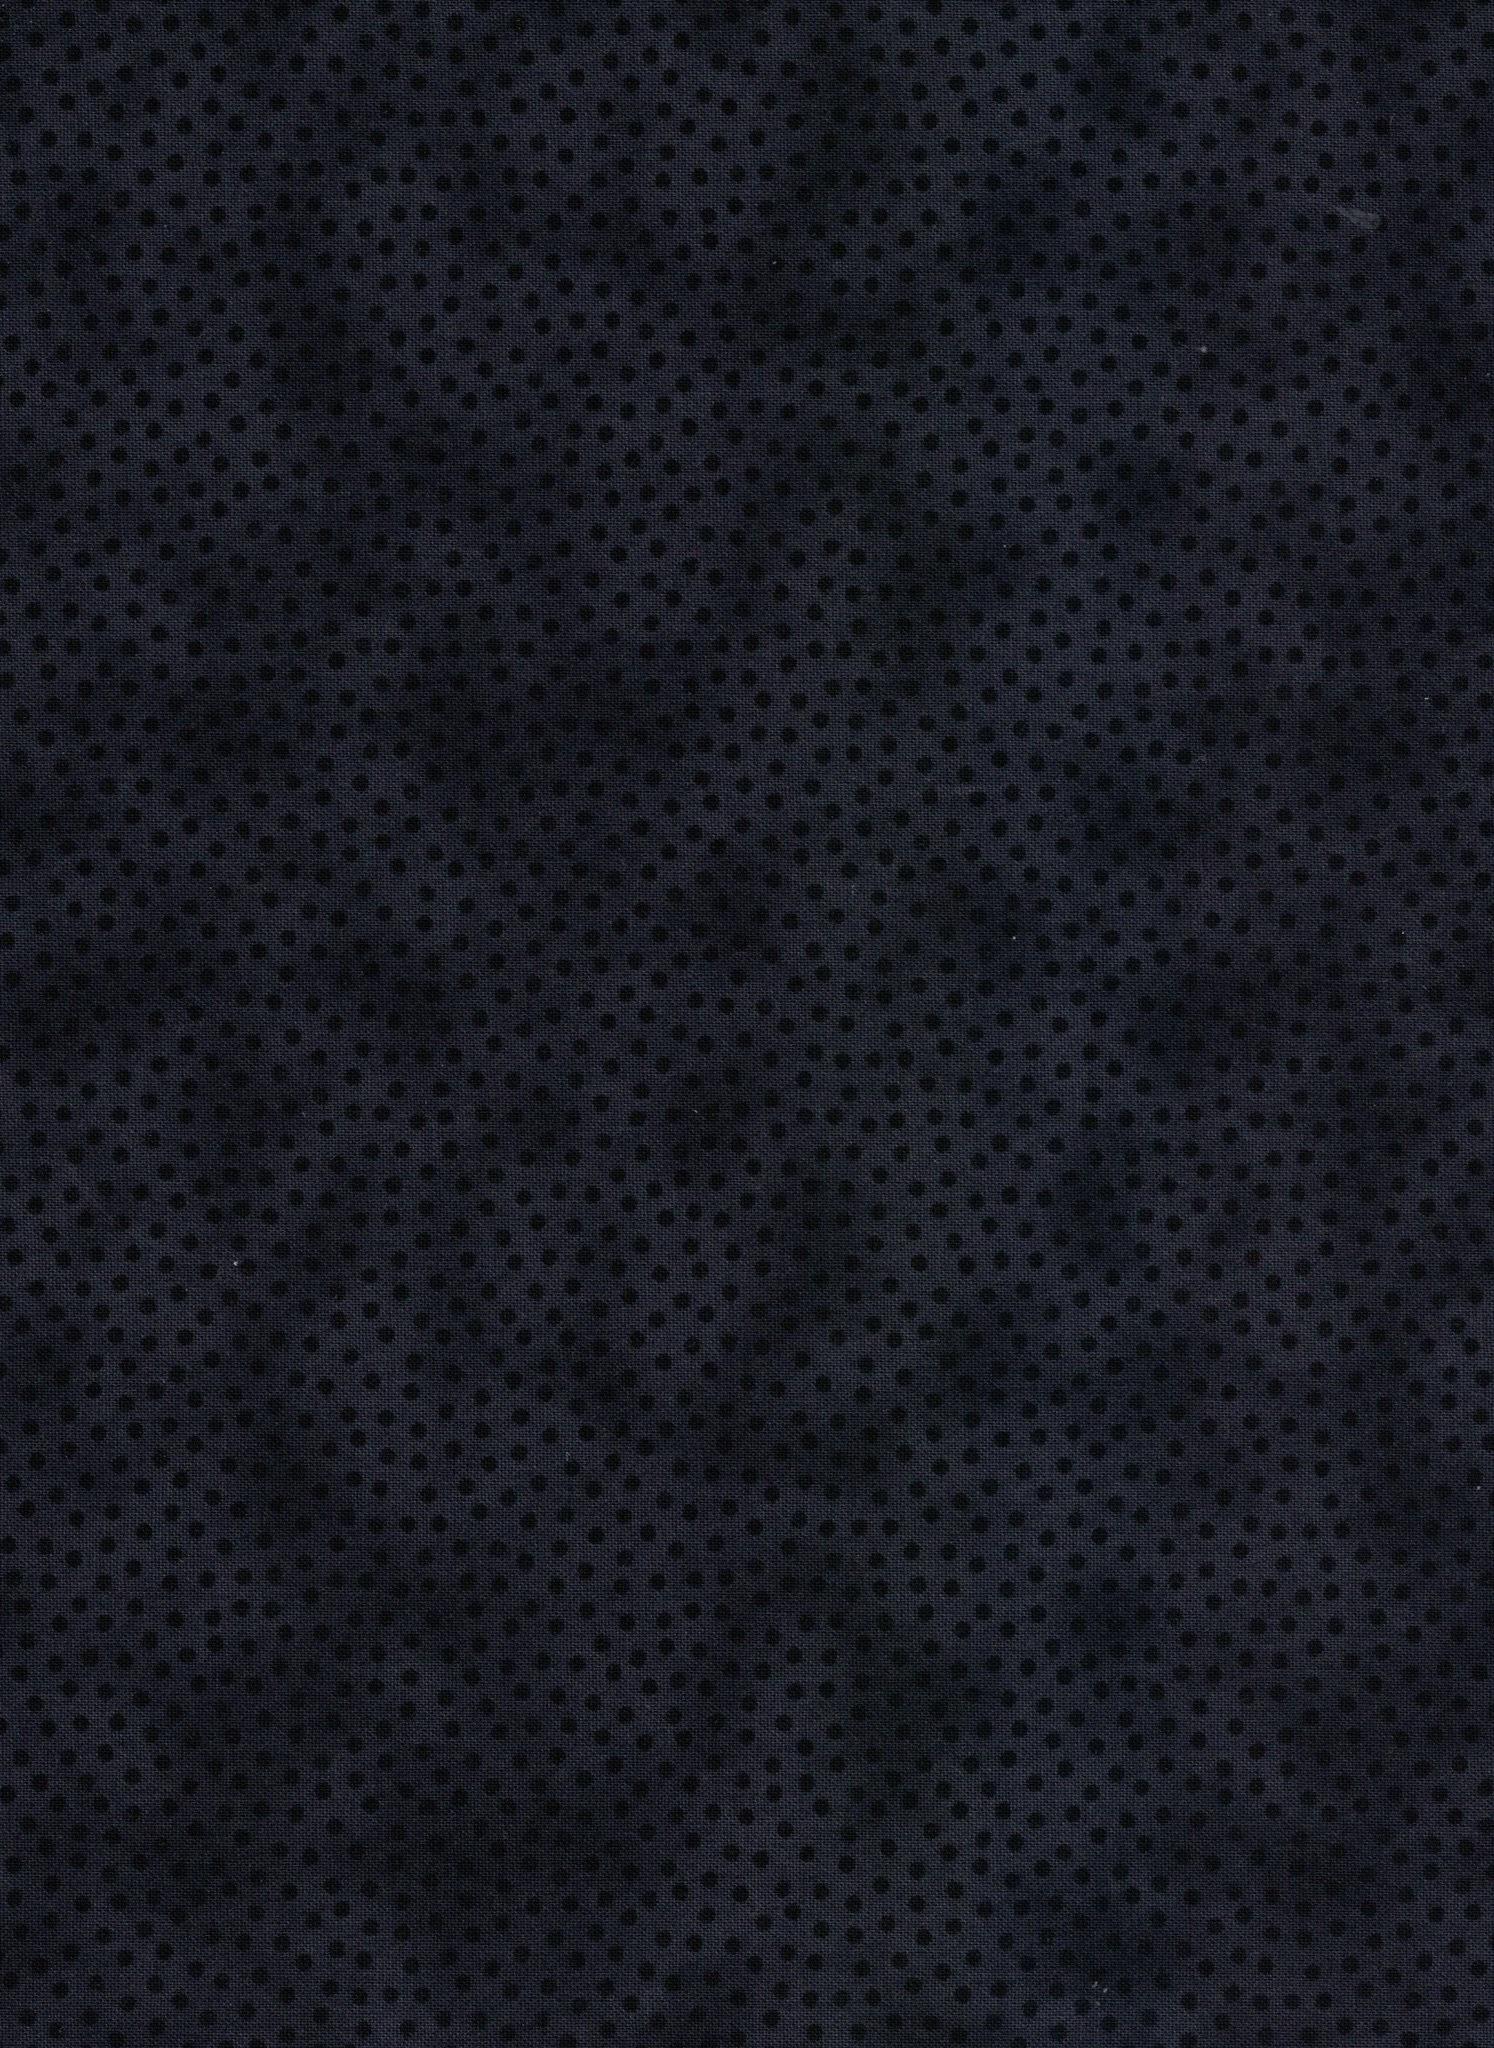 Polka Dot Blender - Black - 1/2m Cut 55769